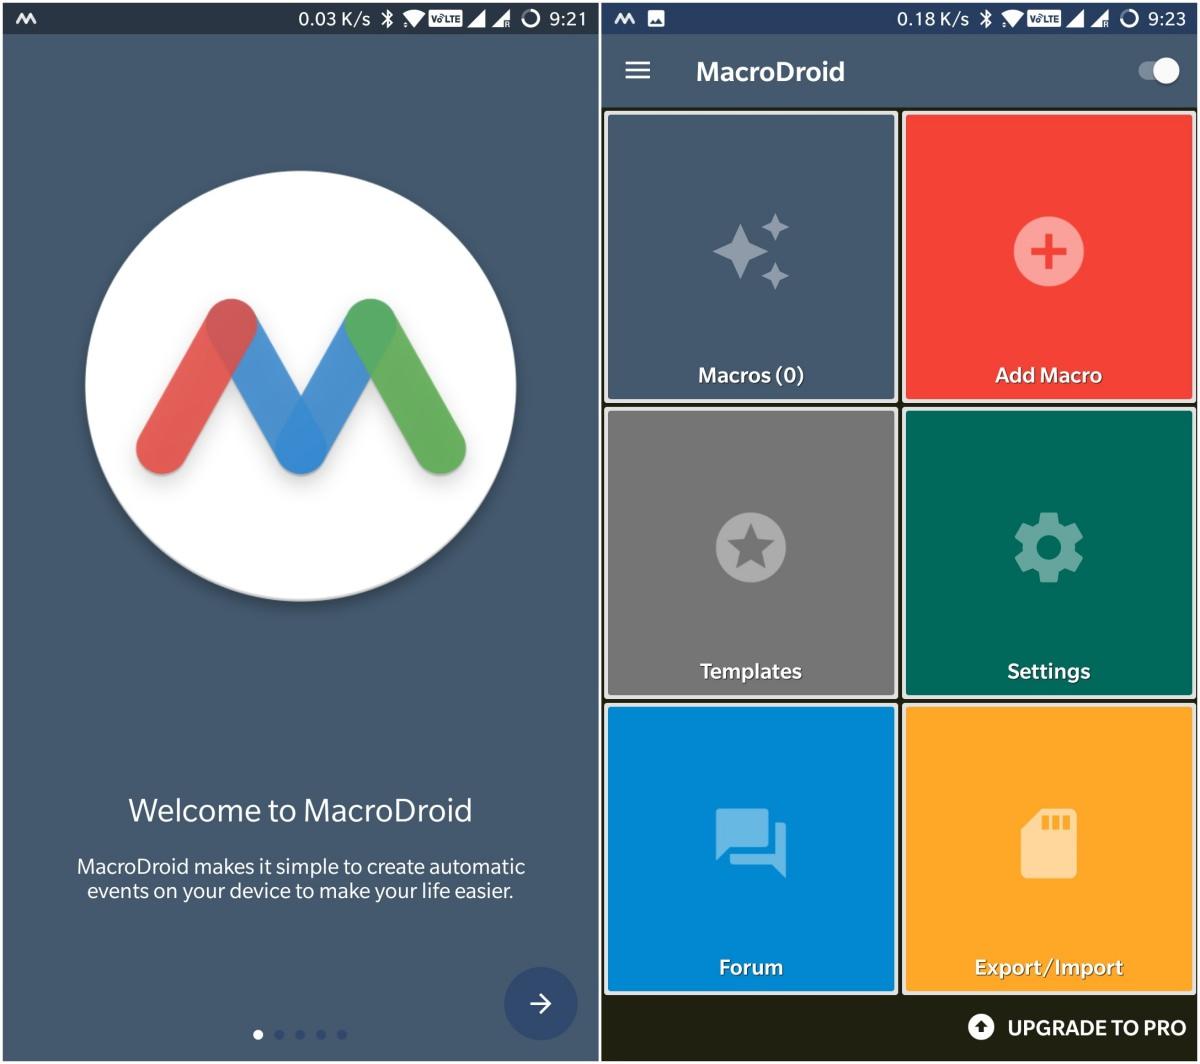 MacroDroid is a simple automation app